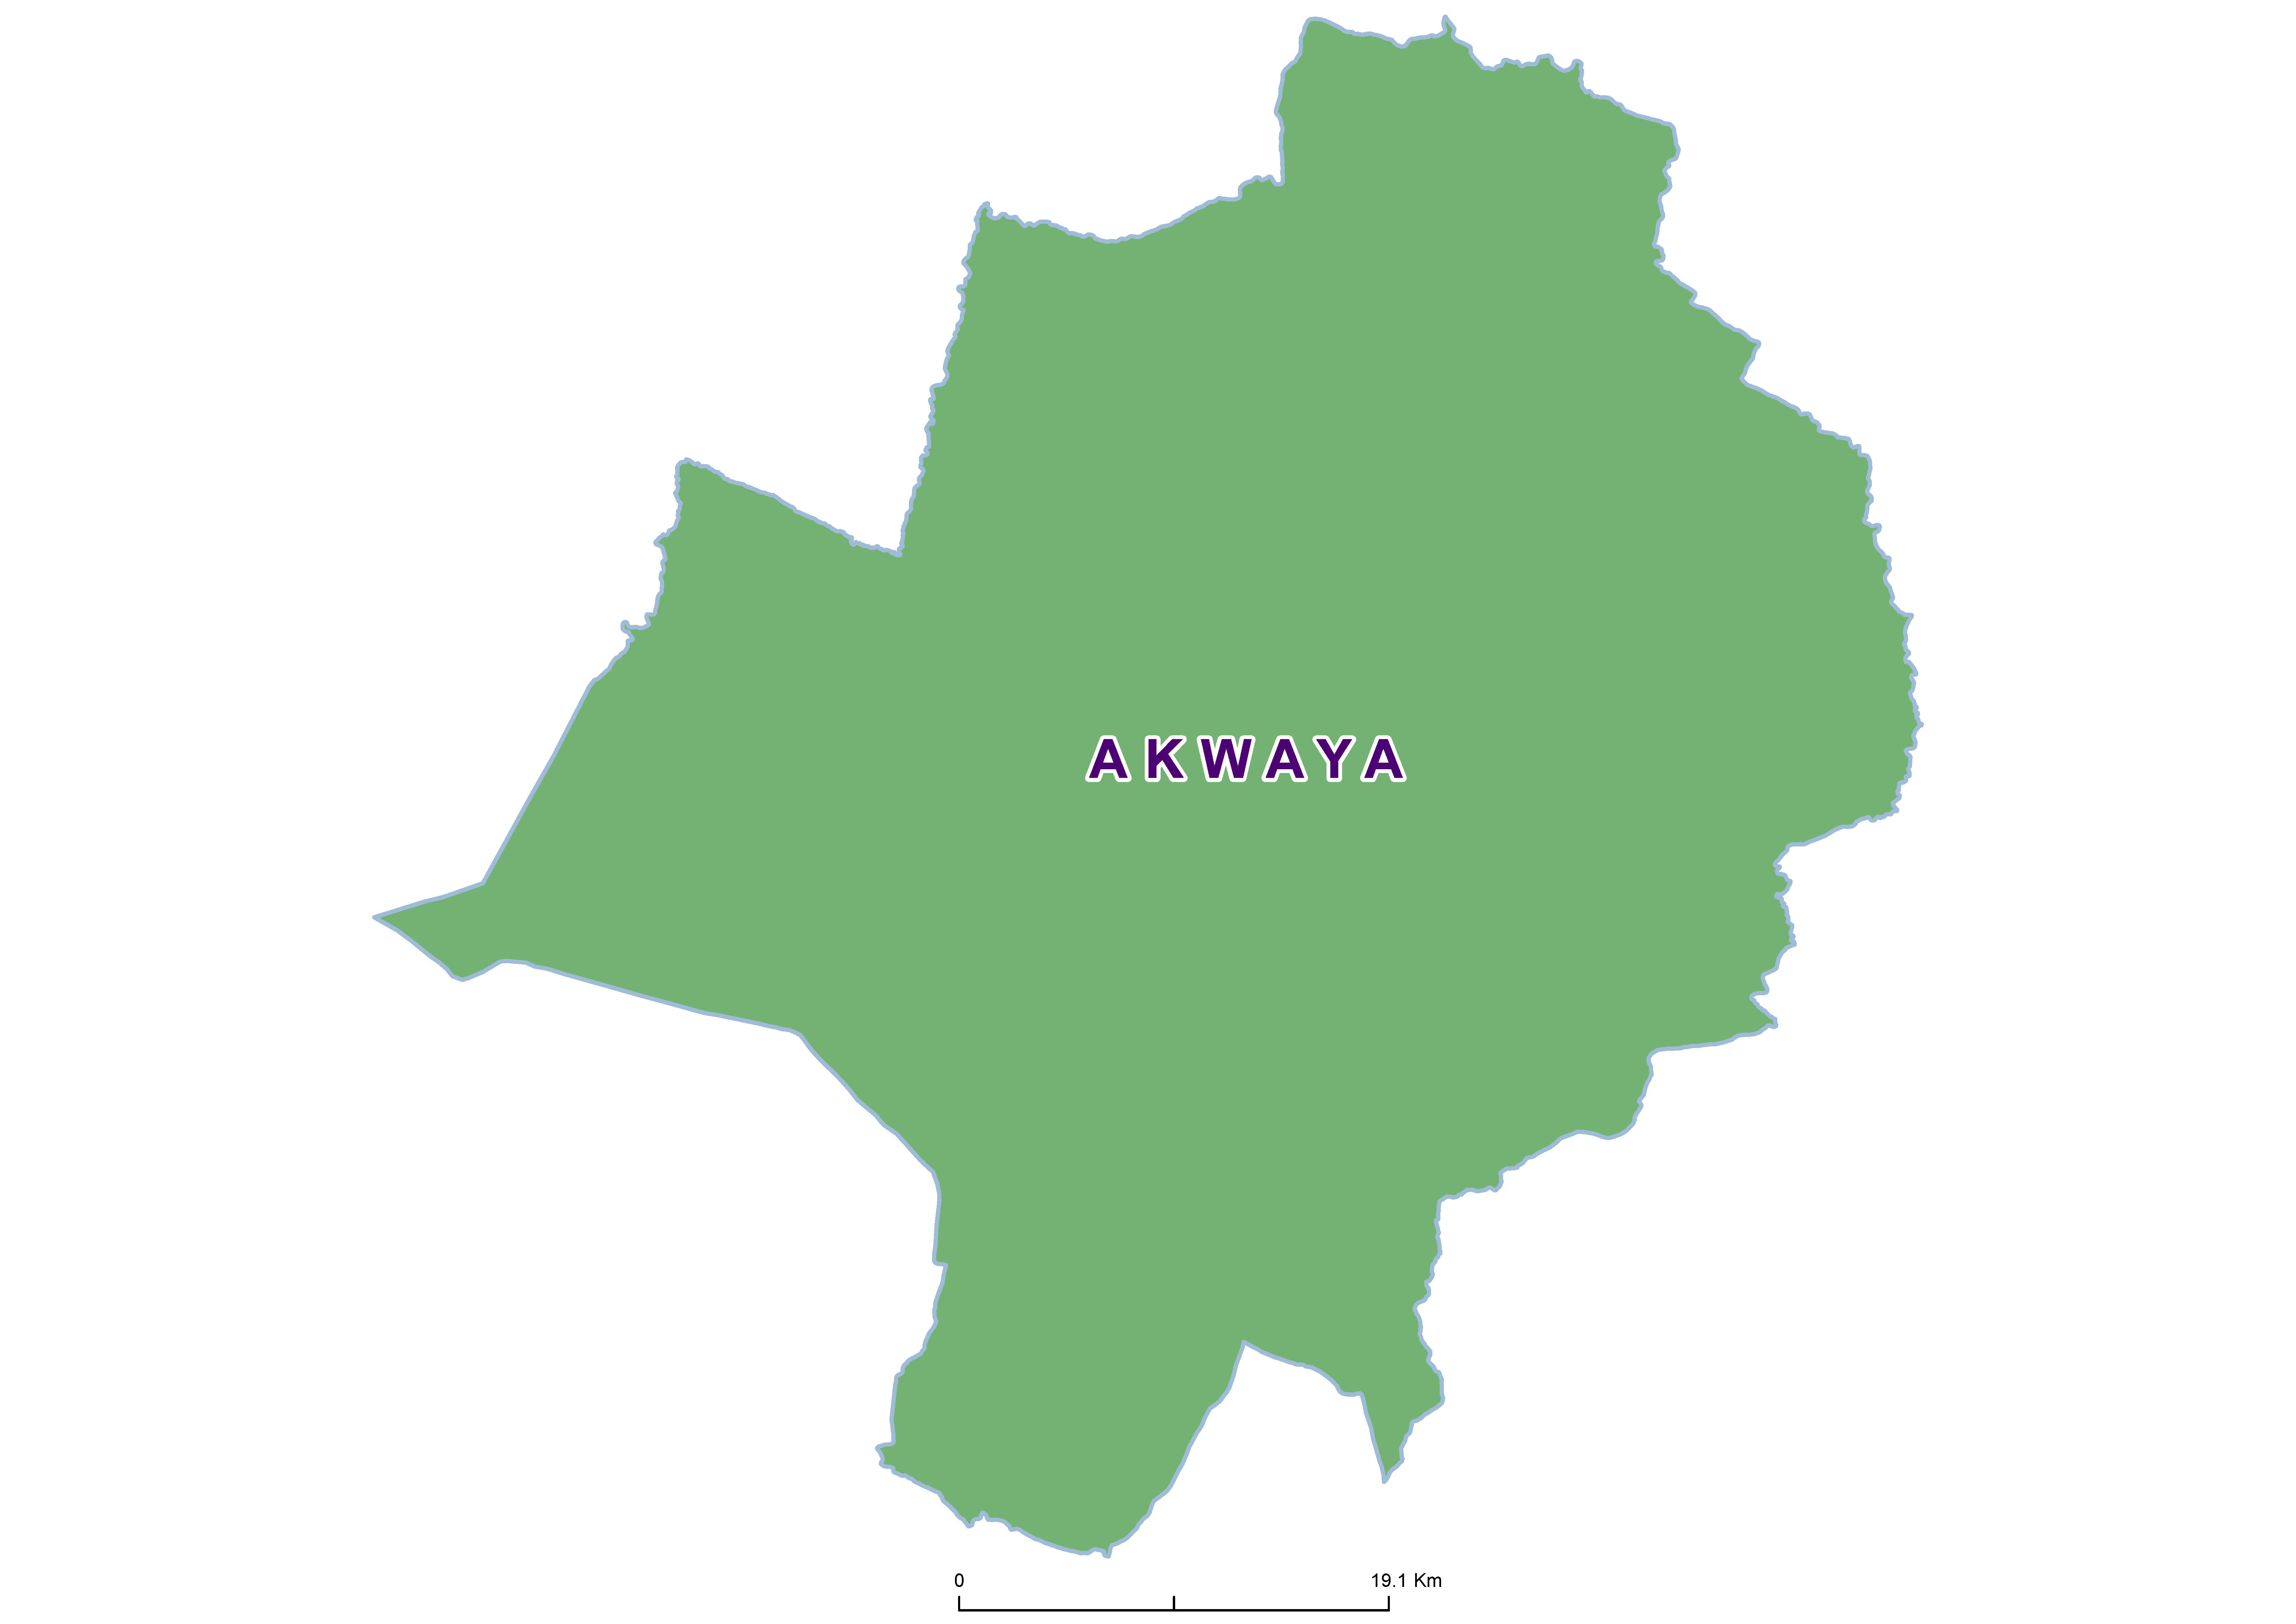 Akwaya Mean SCH 20100001